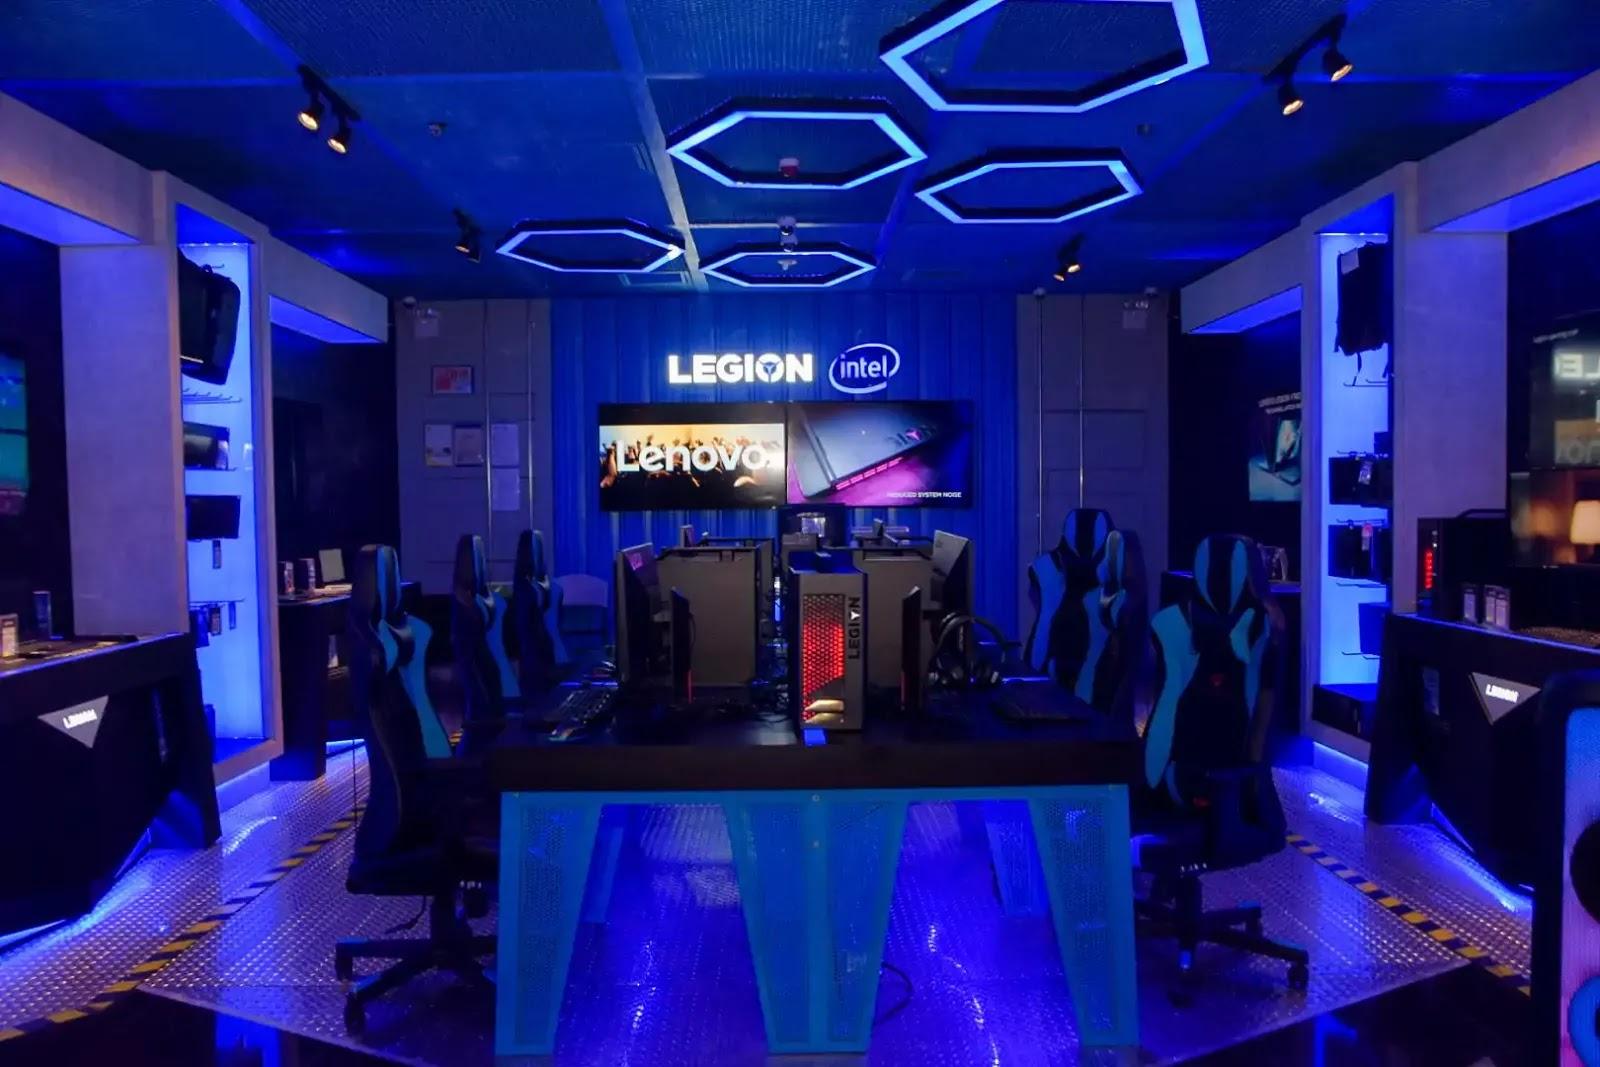 Lenovo Legion Concept Store Cebu